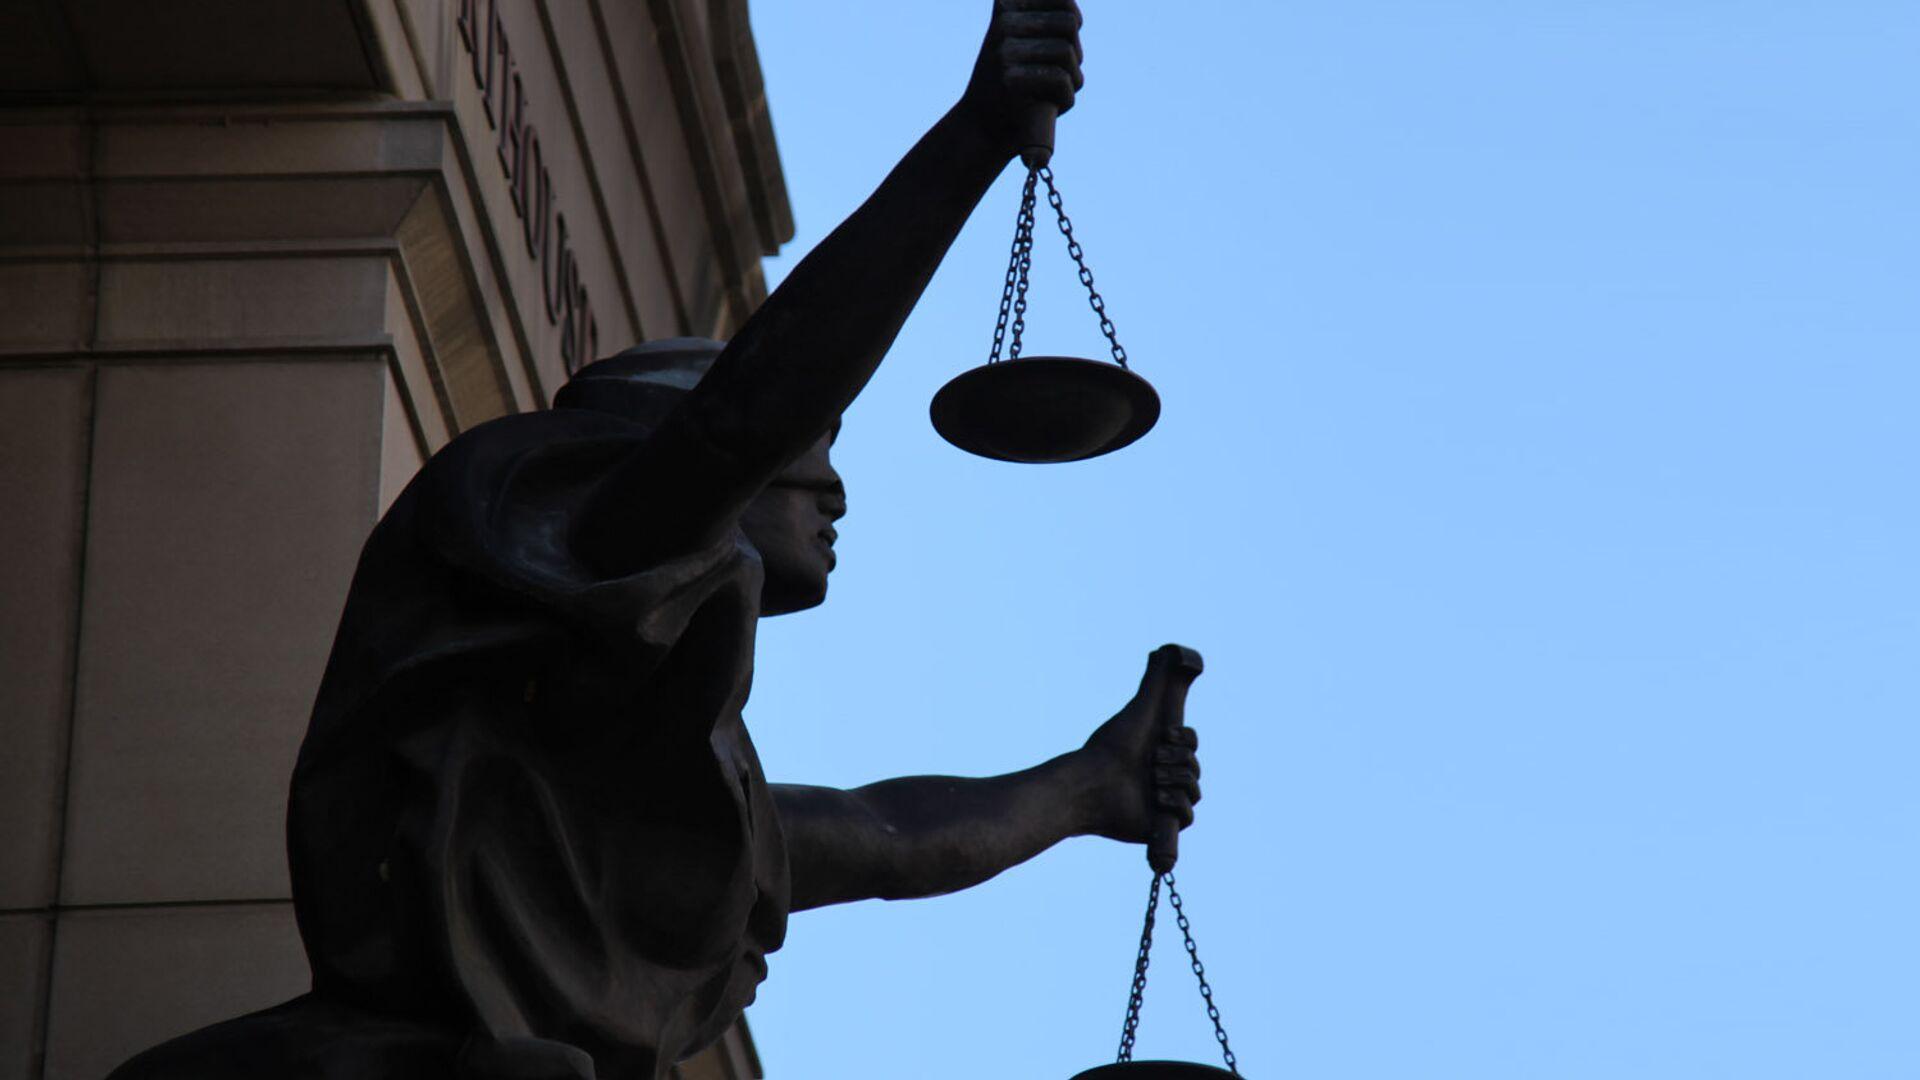 Una estatua de Justicia (imagen referencial) - Sputnik Mundo, 1920, 21.09.2021